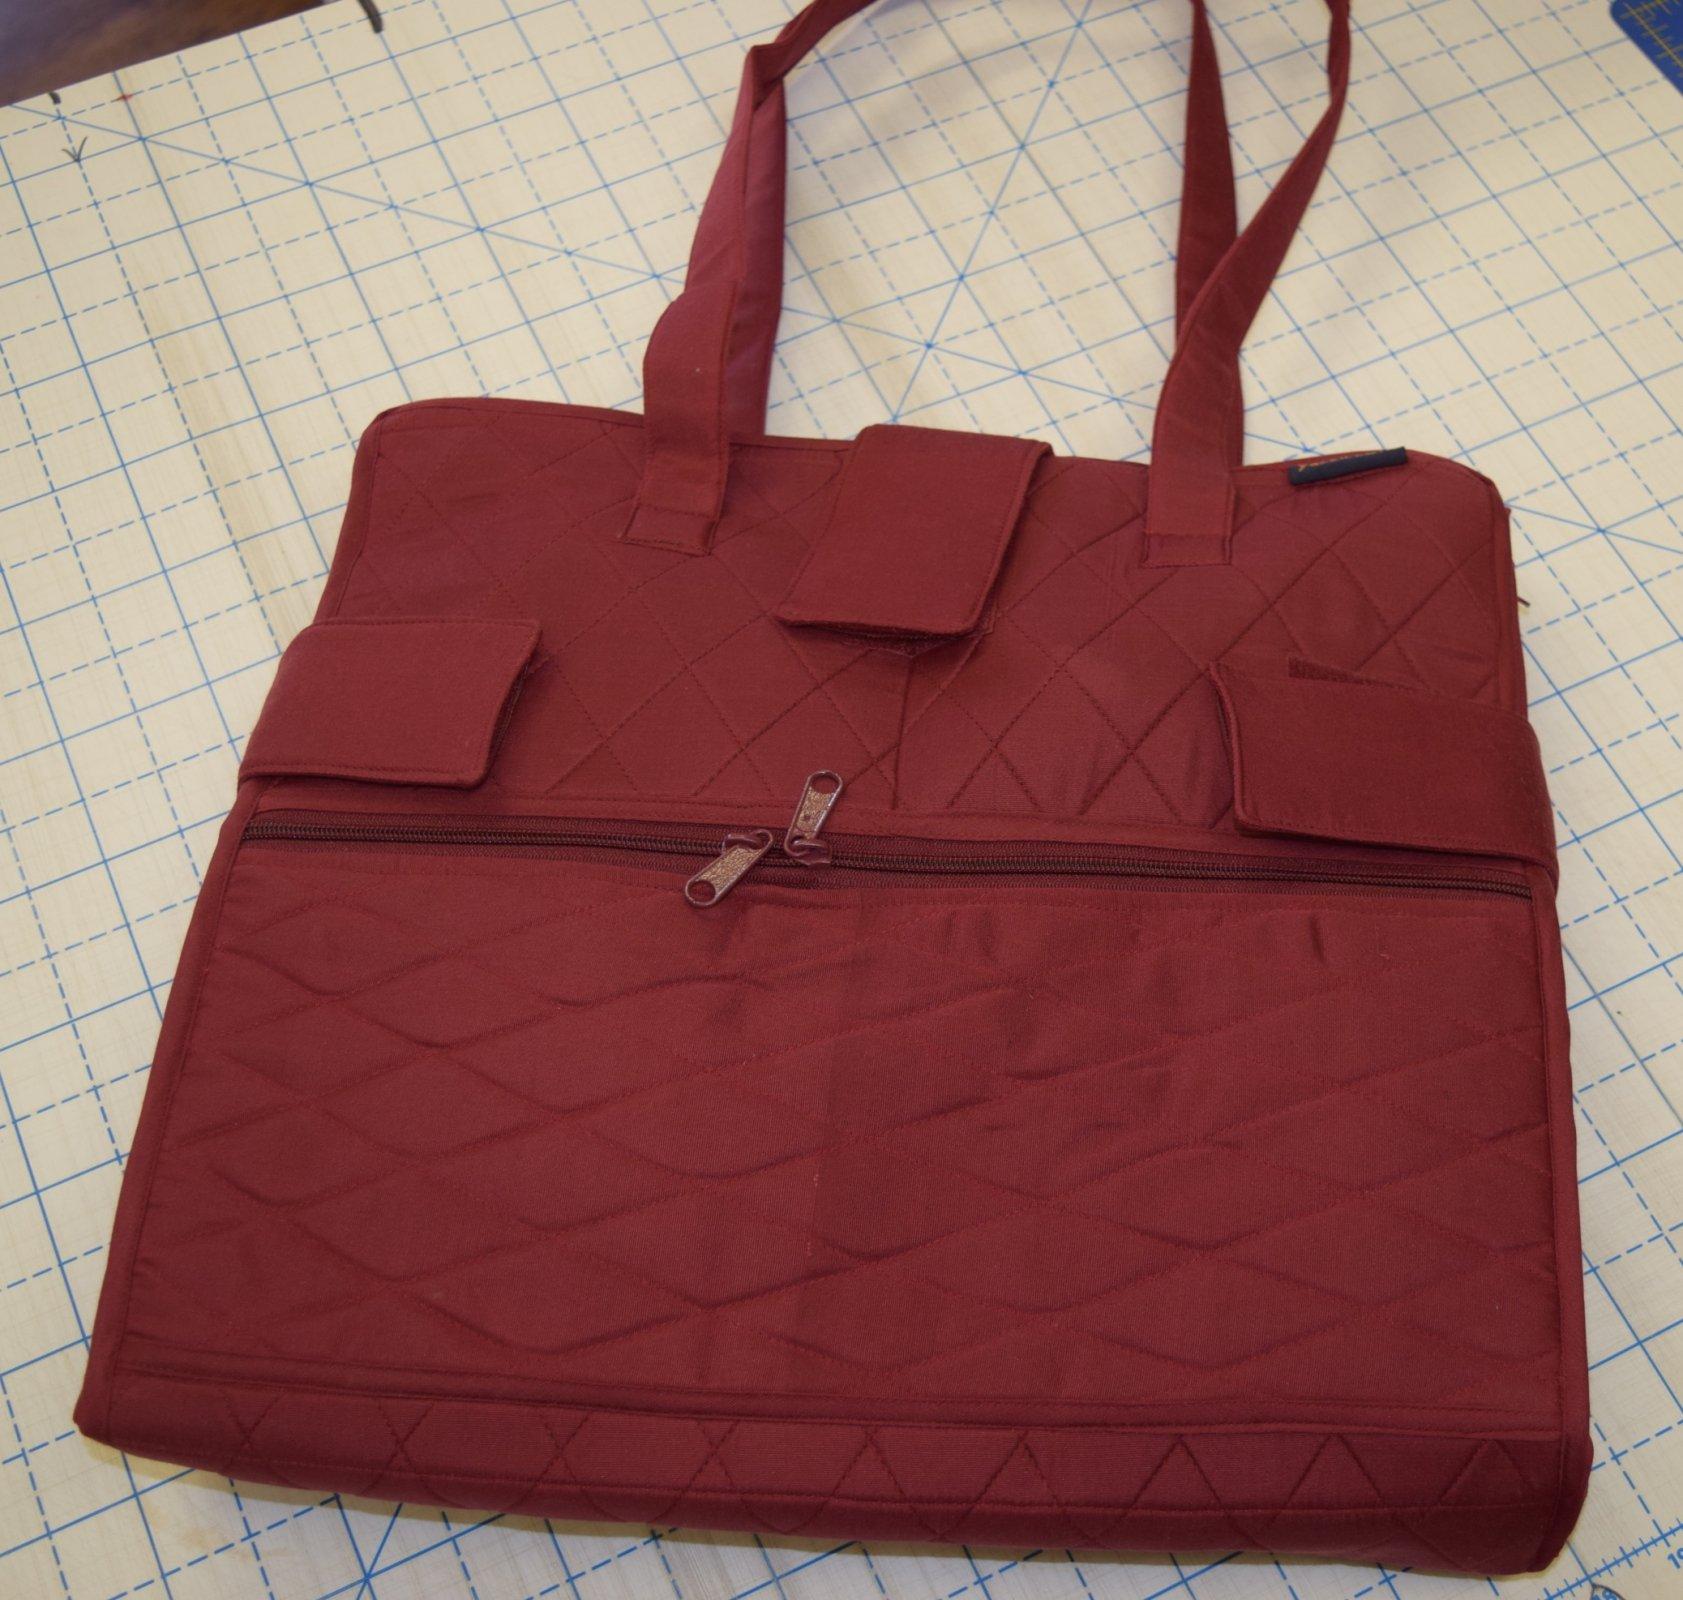 Yazzii Craft Organizer (Mother of All Handworker's Bag)